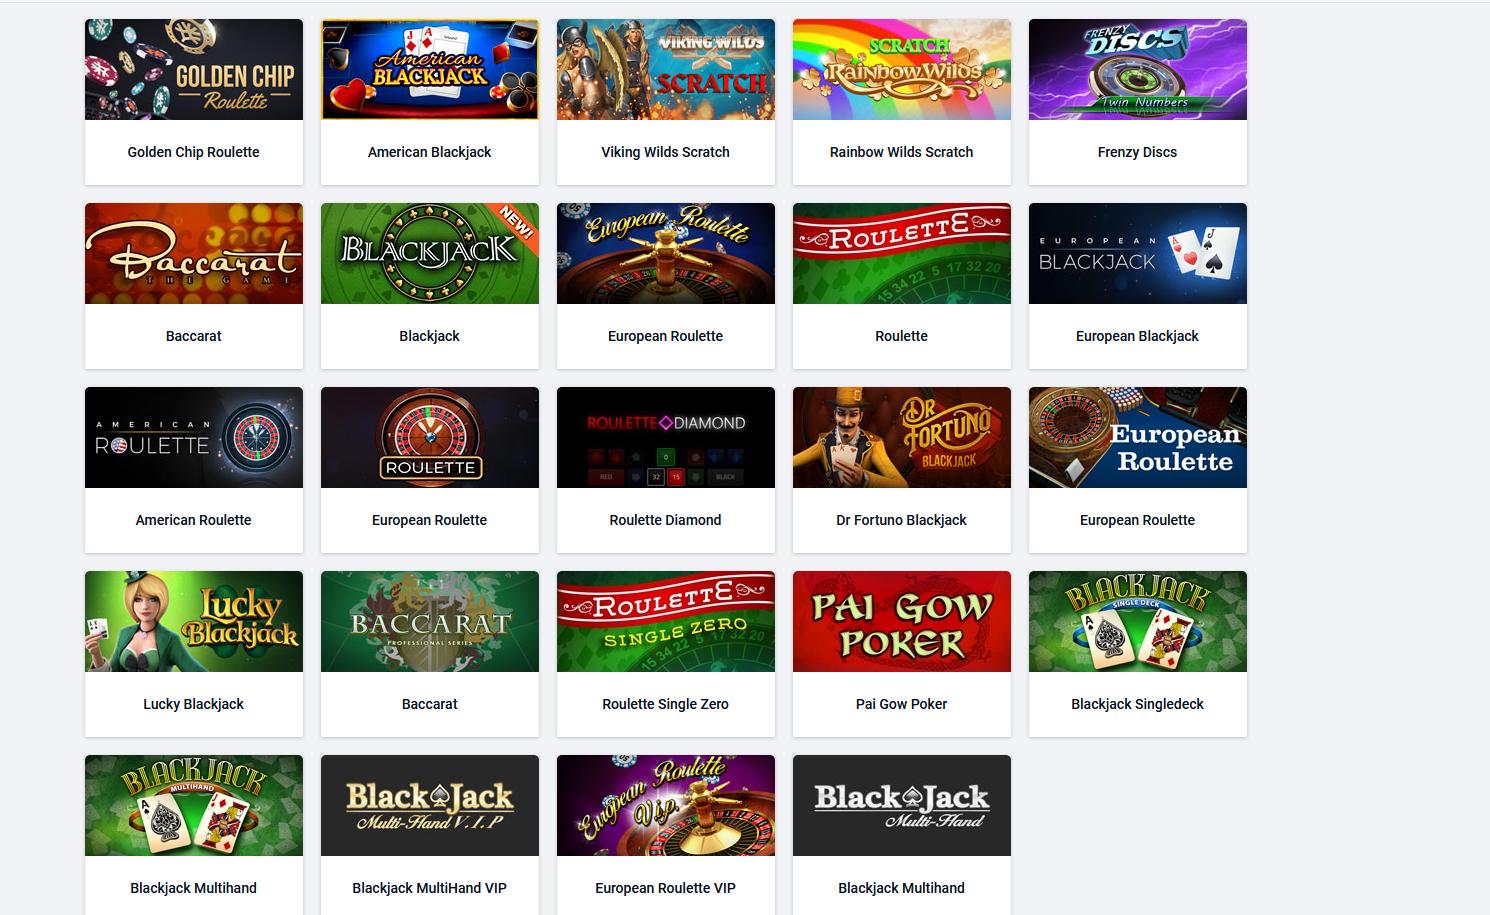 Pinnacle kazino - igre za stolom